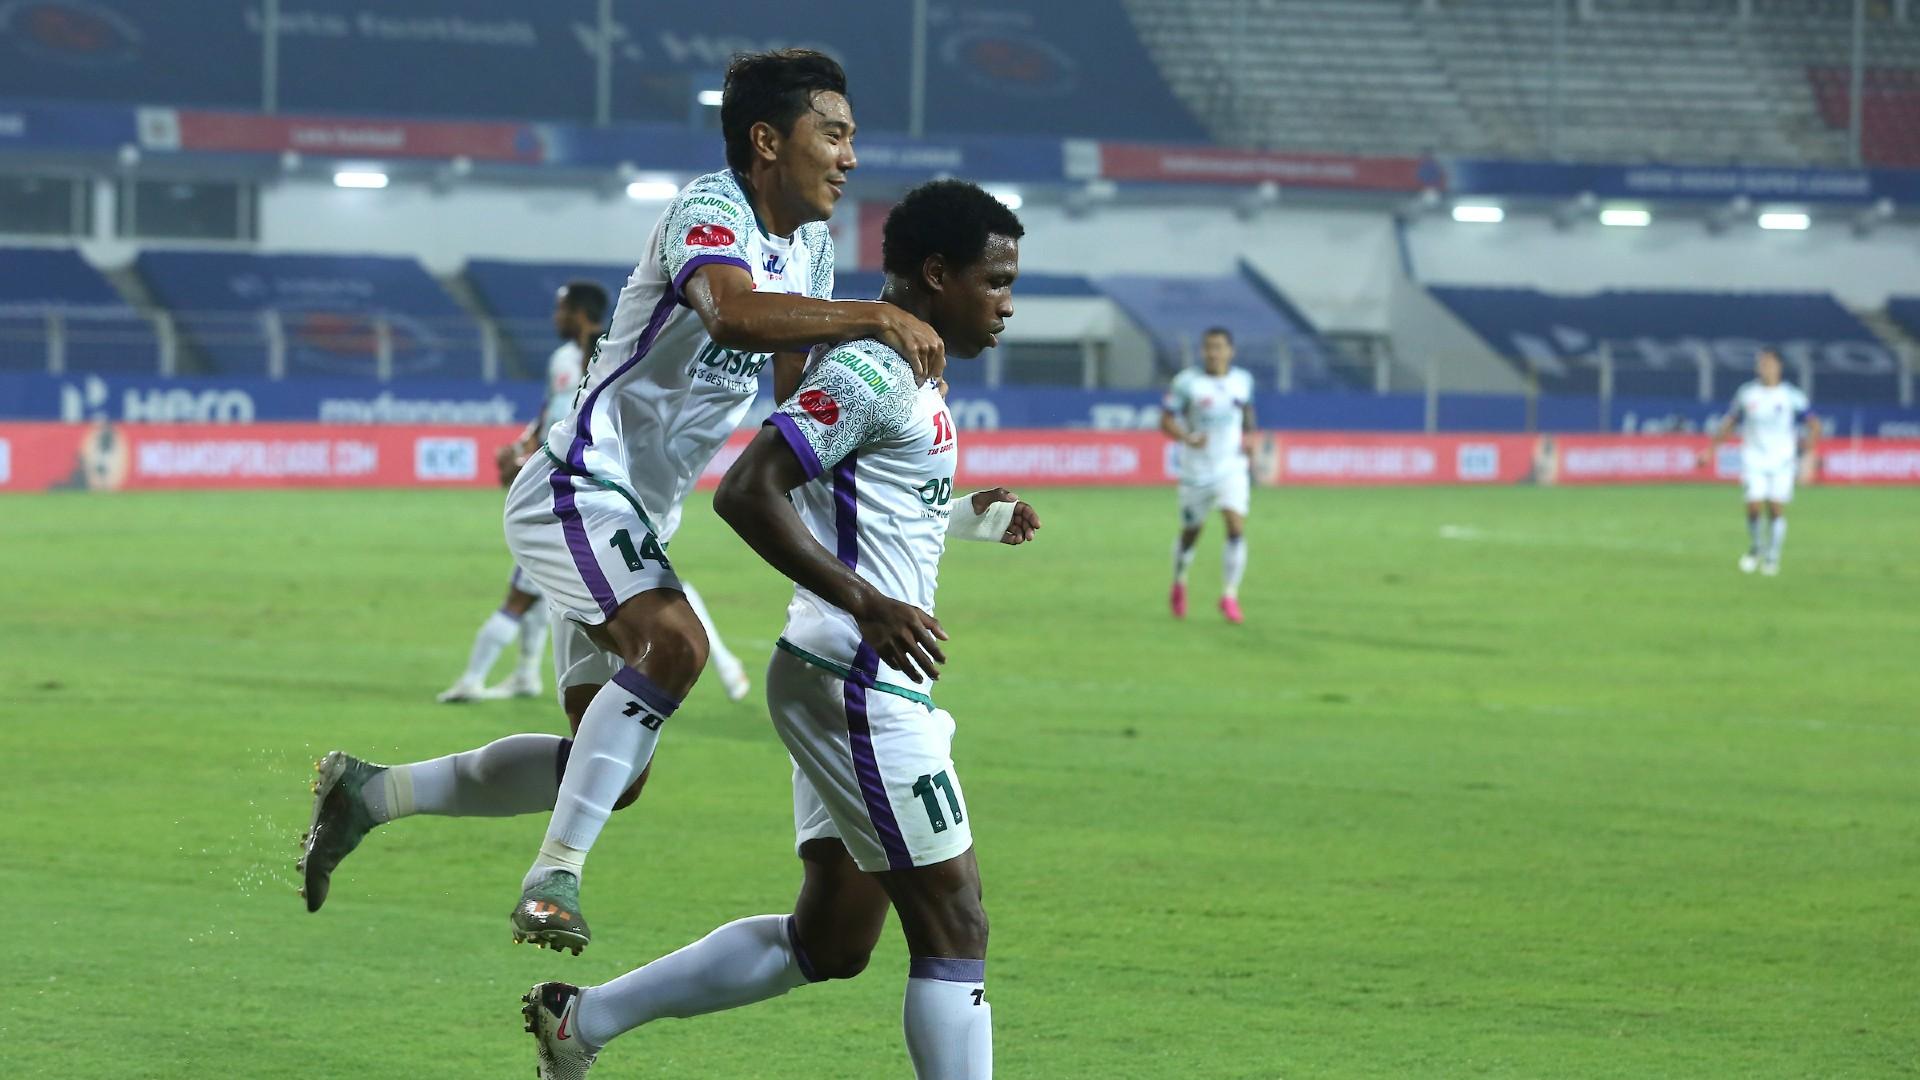 Bengaluru 0-1 Odisha LIVE: Mauricio gives the Juggernauts the lead